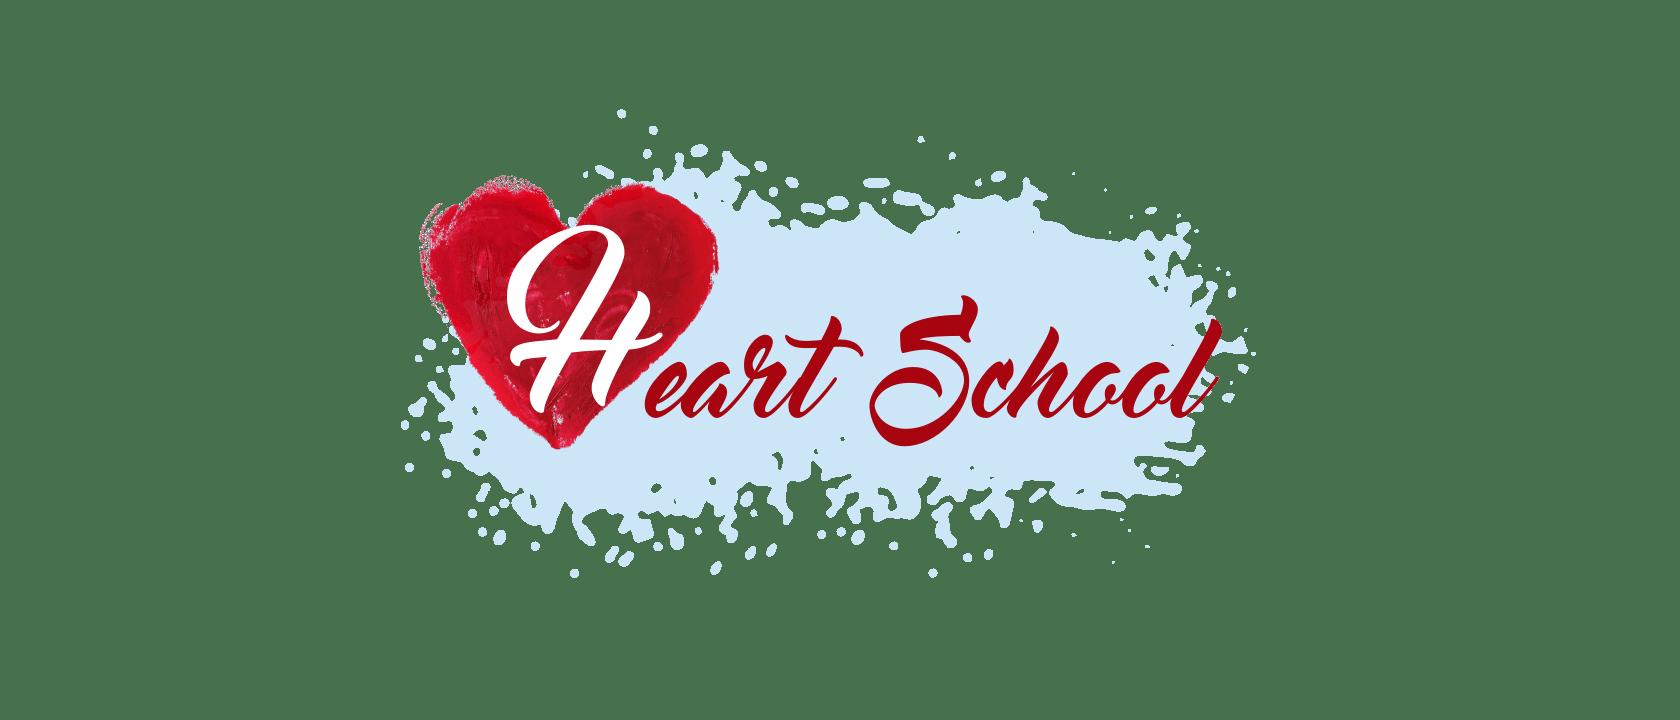 Heart School